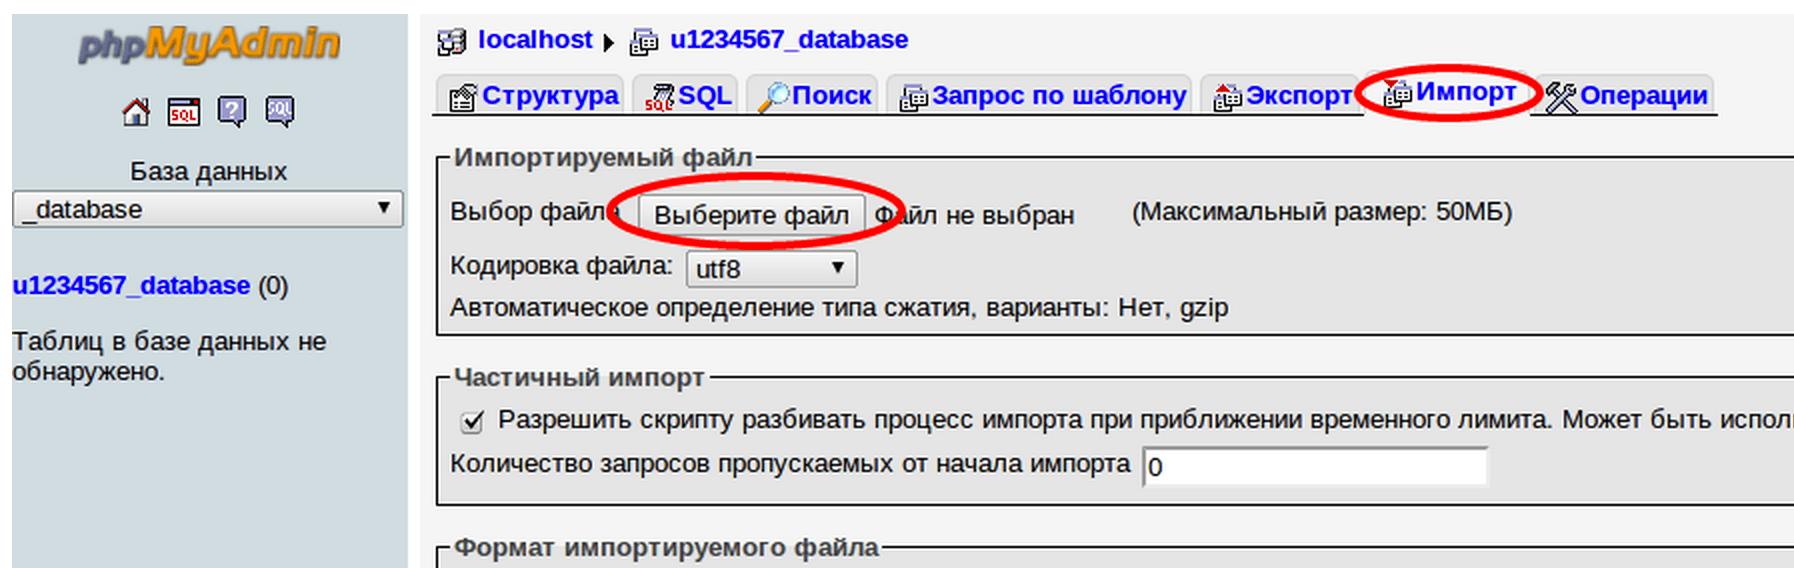 укажите файл базы данных